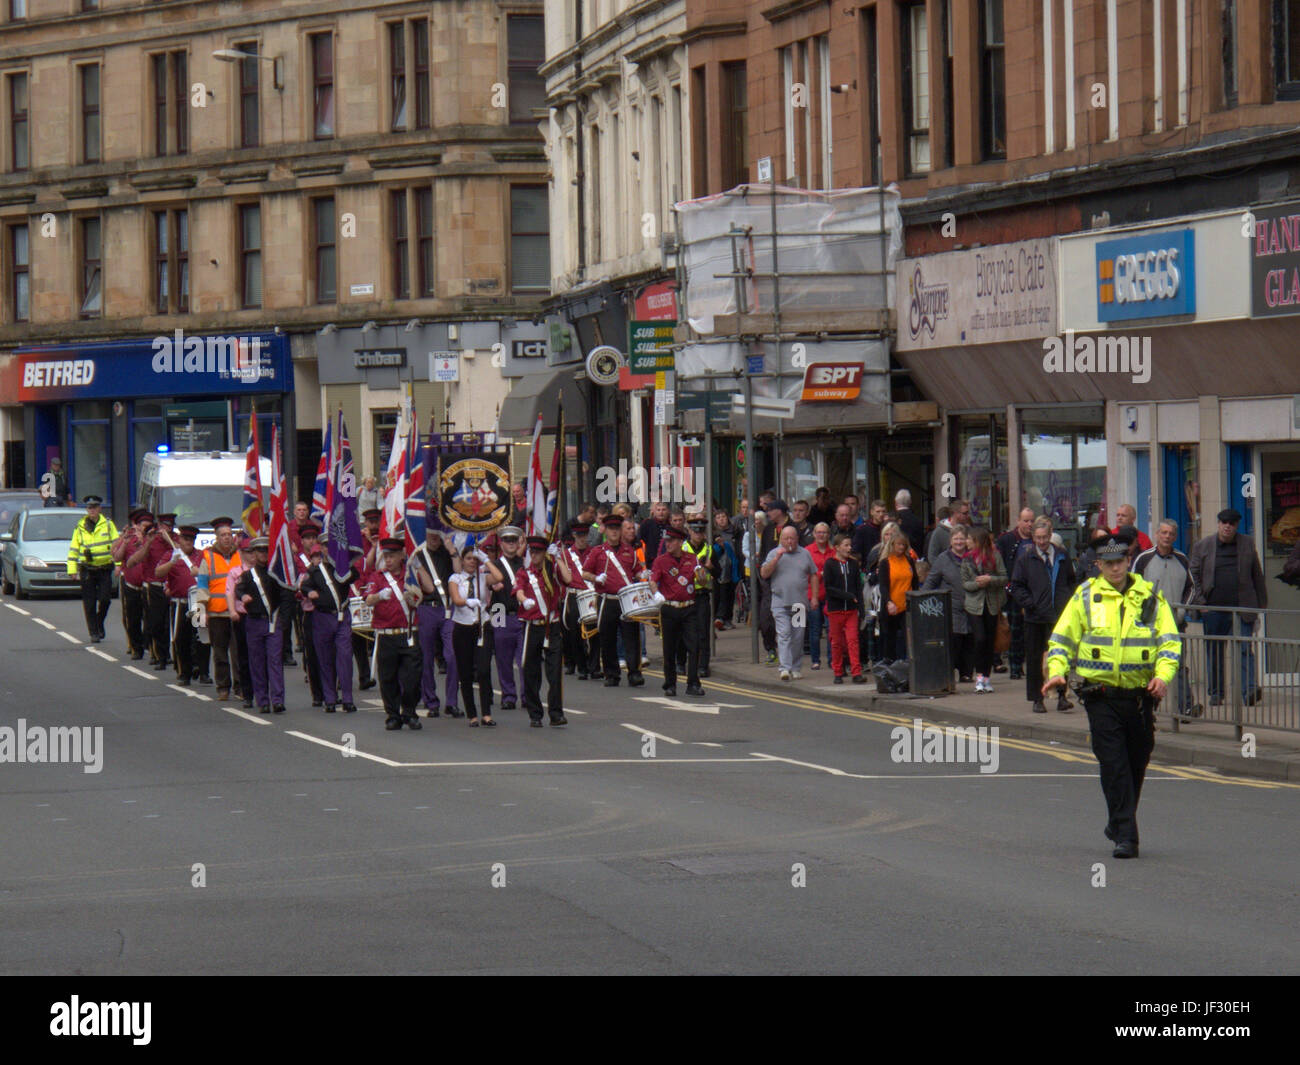 sectarian orange walk order protestant march Glasgow Scotland heavy police presence - Stock Image